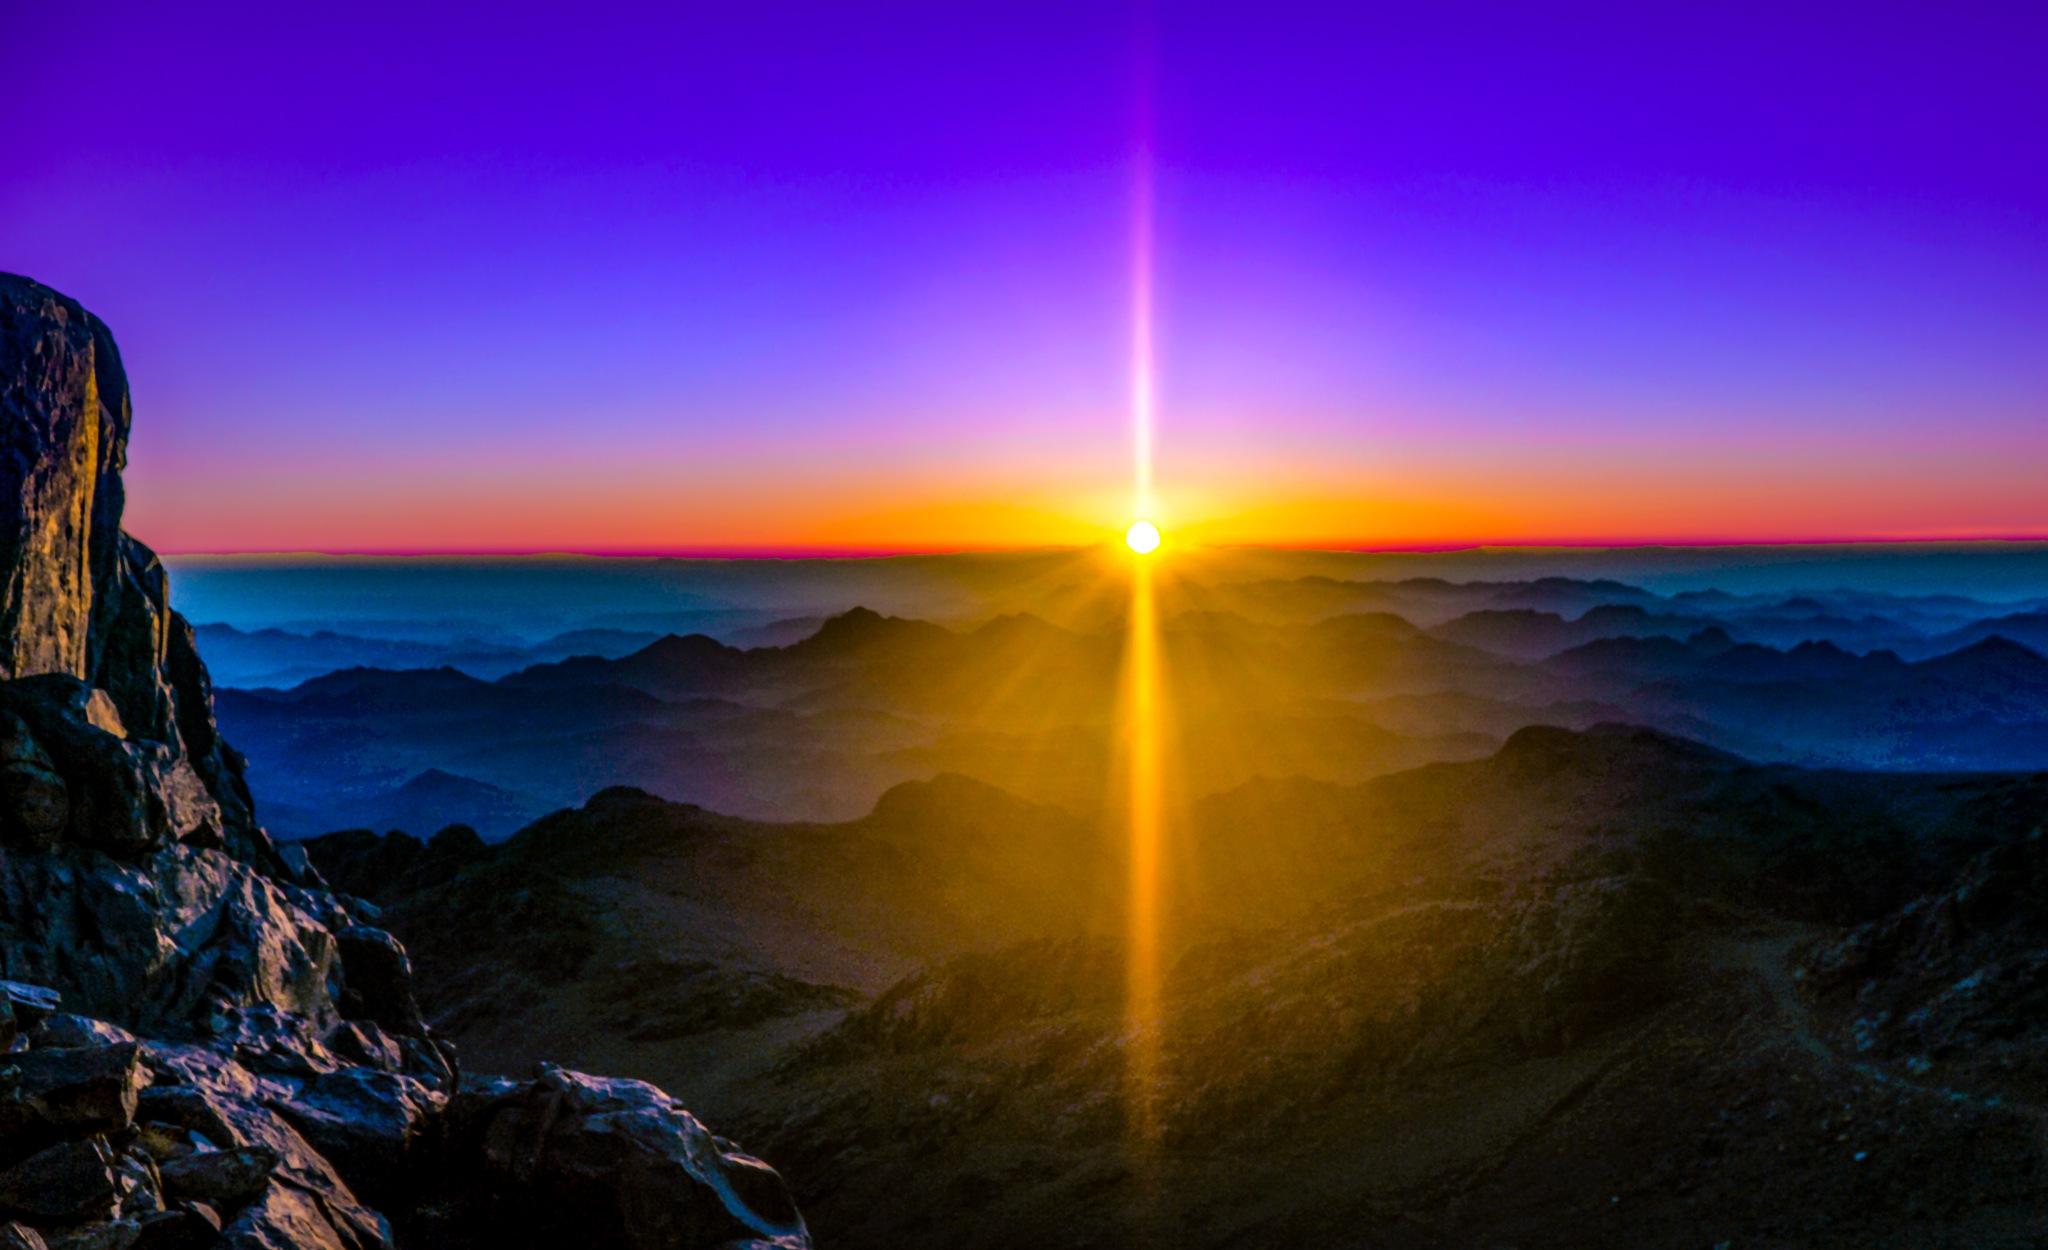 Sunrise over the Sinai Peninsula by Natallia Locricchio